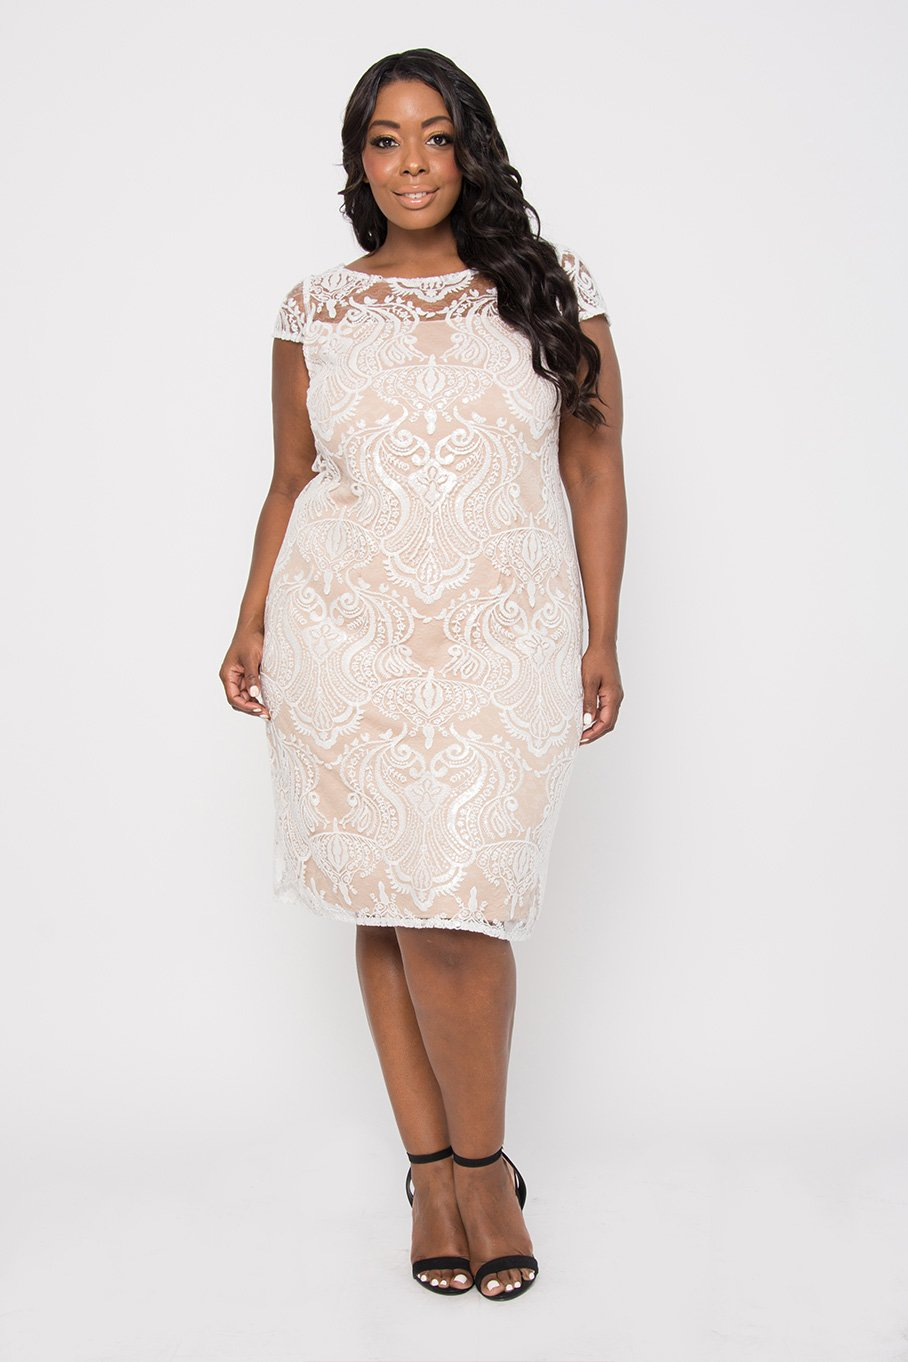 9d2eab40a24 R M Richards Short Plus Size Formal Mother of Bride Cocktail Dress ...